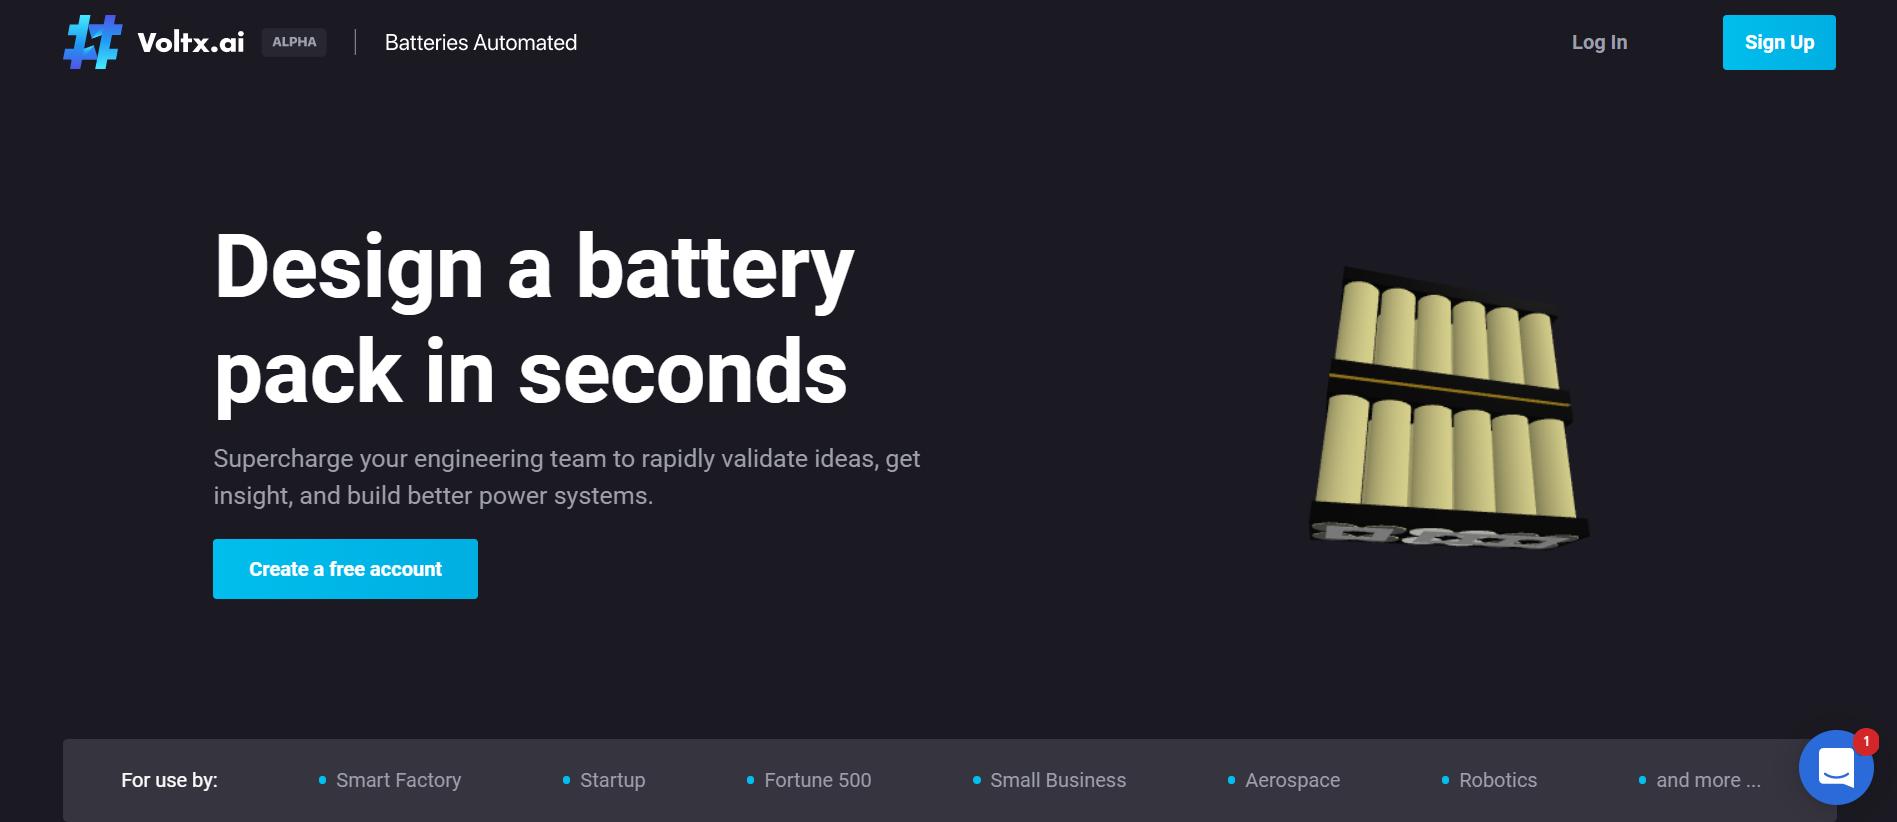 Voltx.ai – AI-Based Rapid Battery Pack Design Service